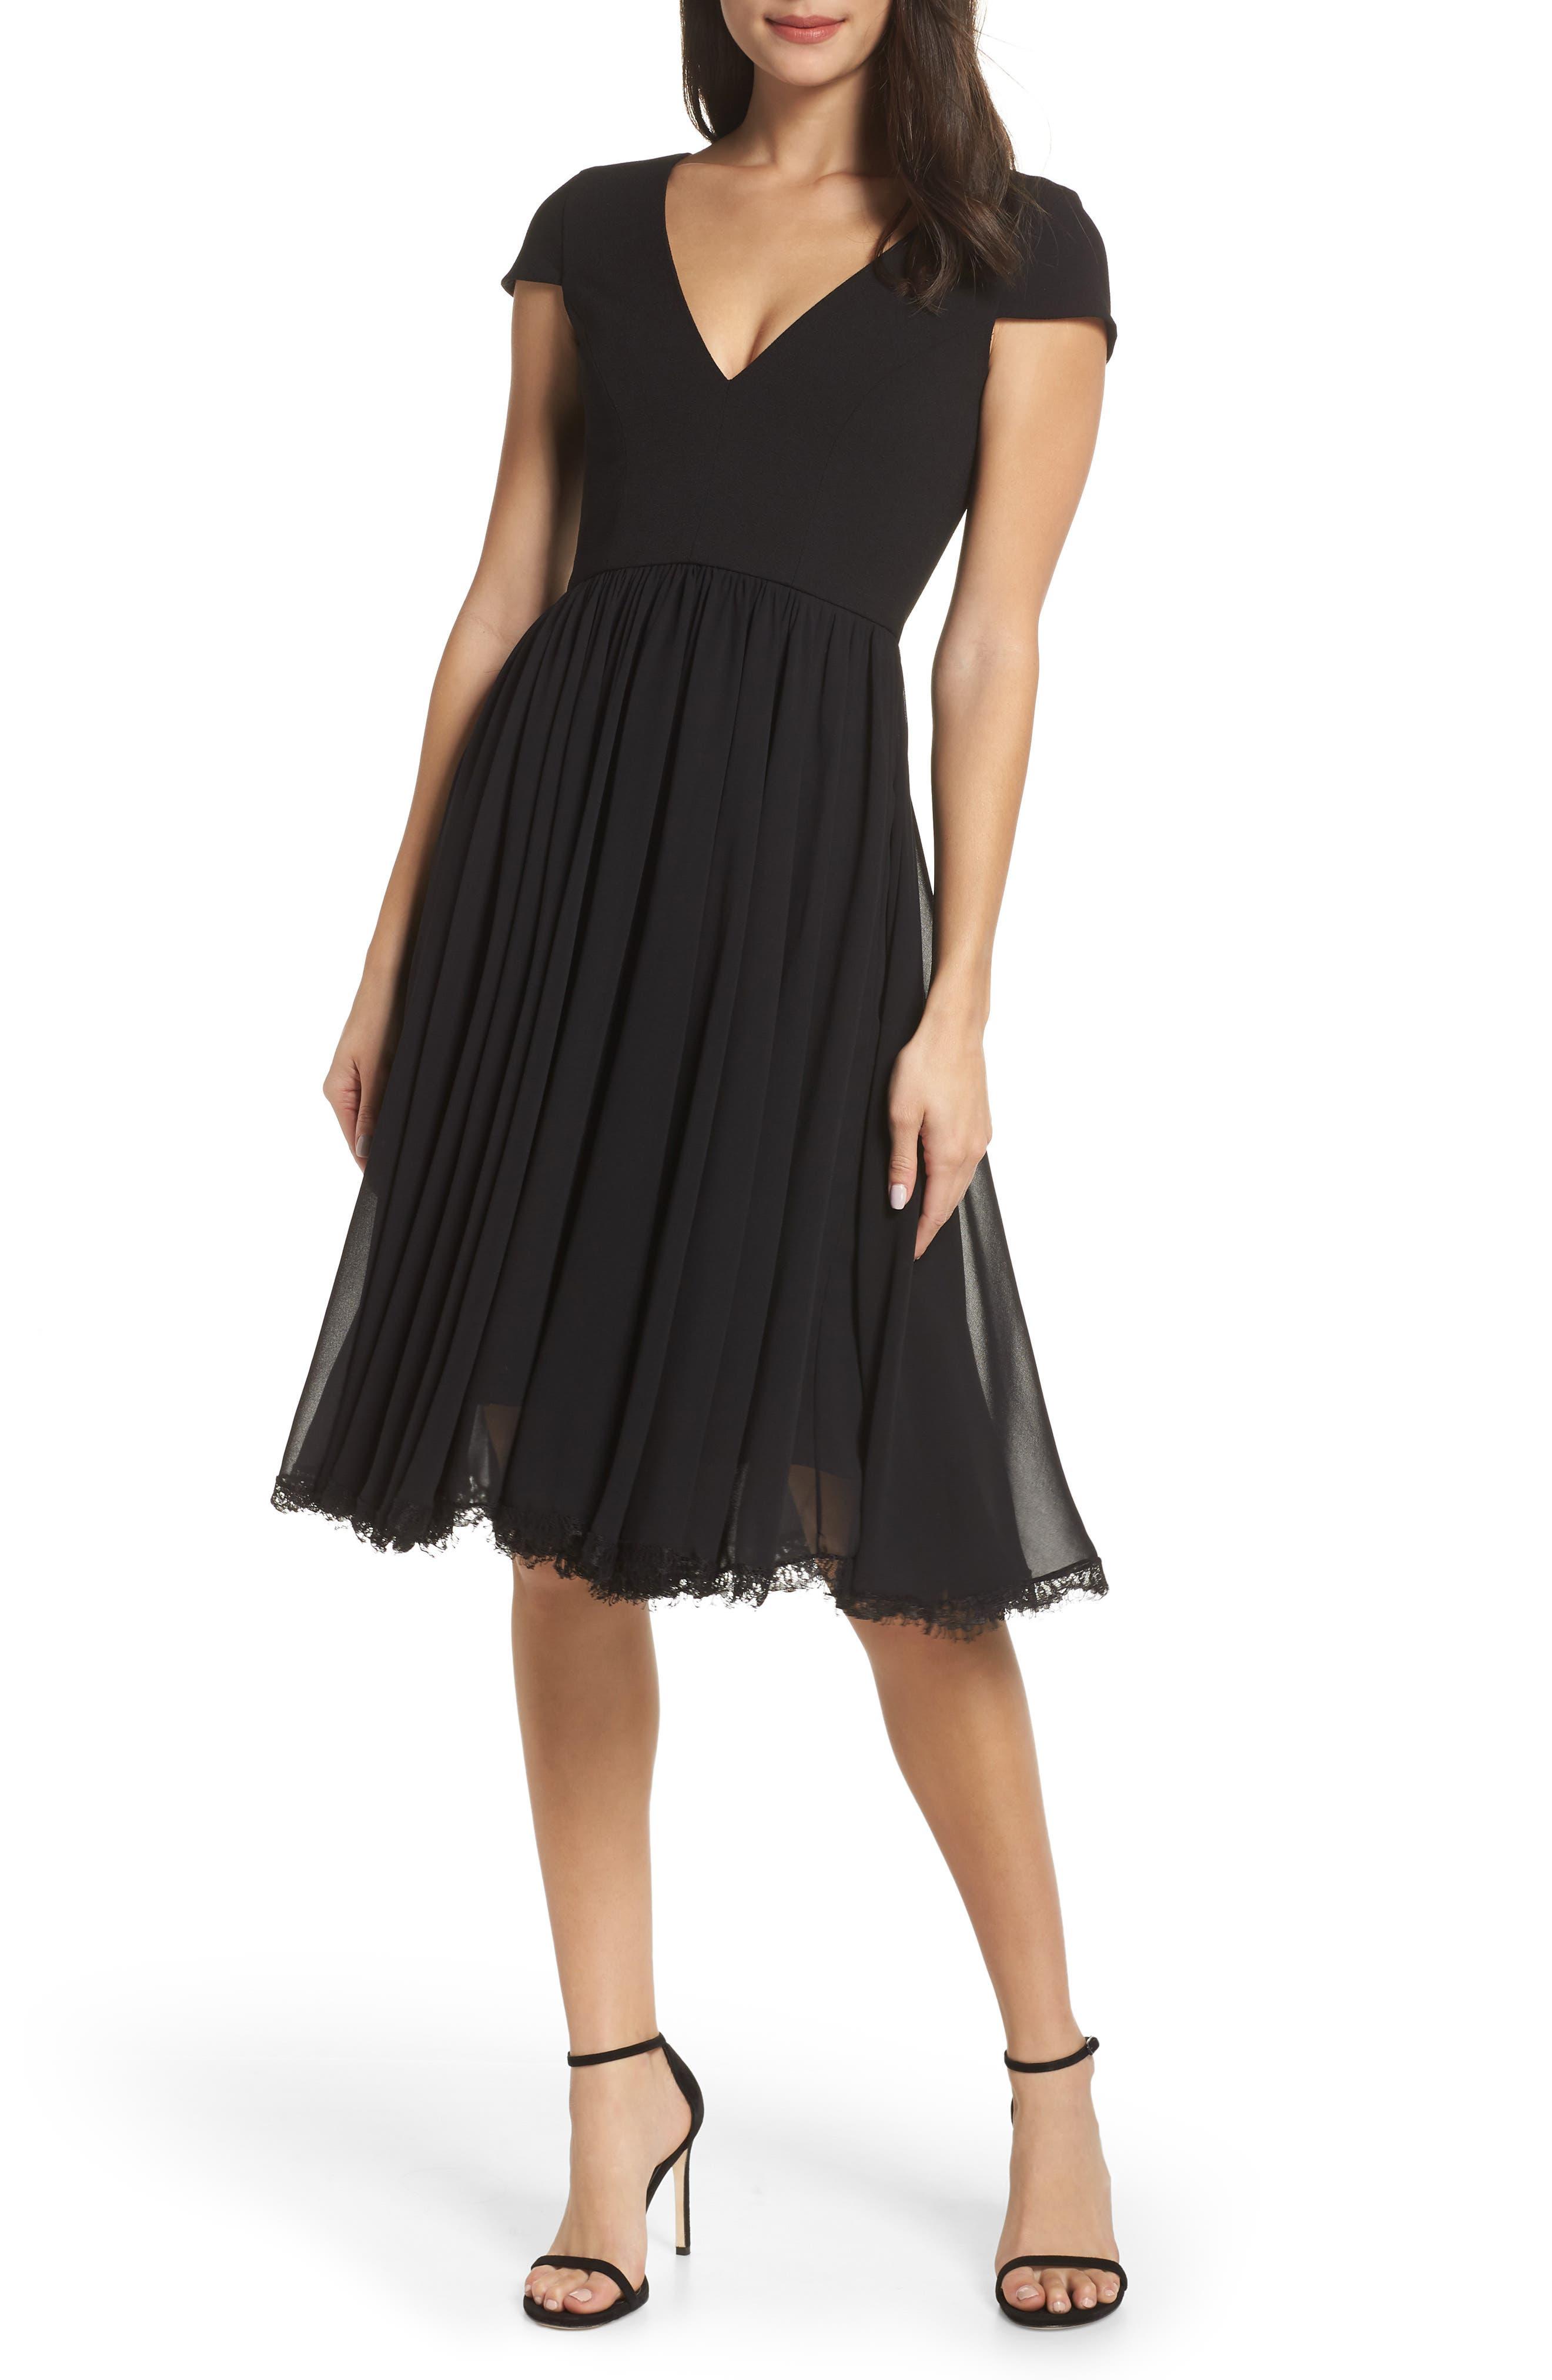 Quarry Size 12 Dessy Womens Cocktail Length V-Neck Dupioni Dress with Inset Waistband